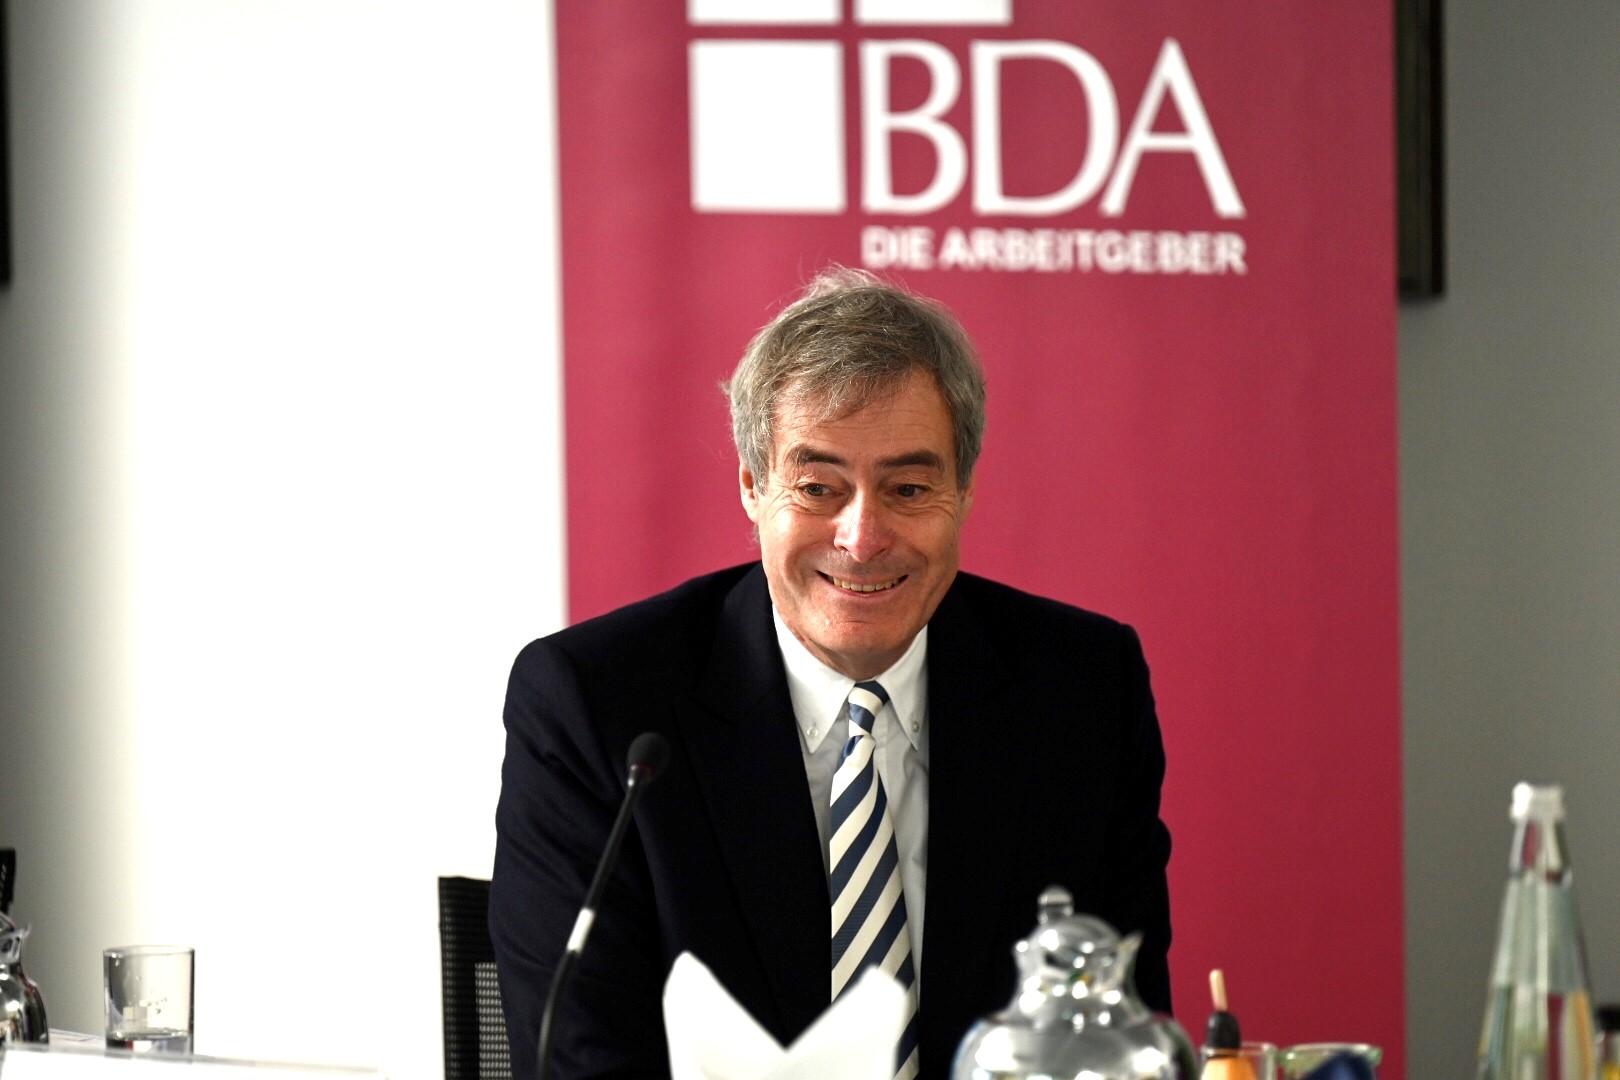 Bda Arbeitgeber Mv 2020 02